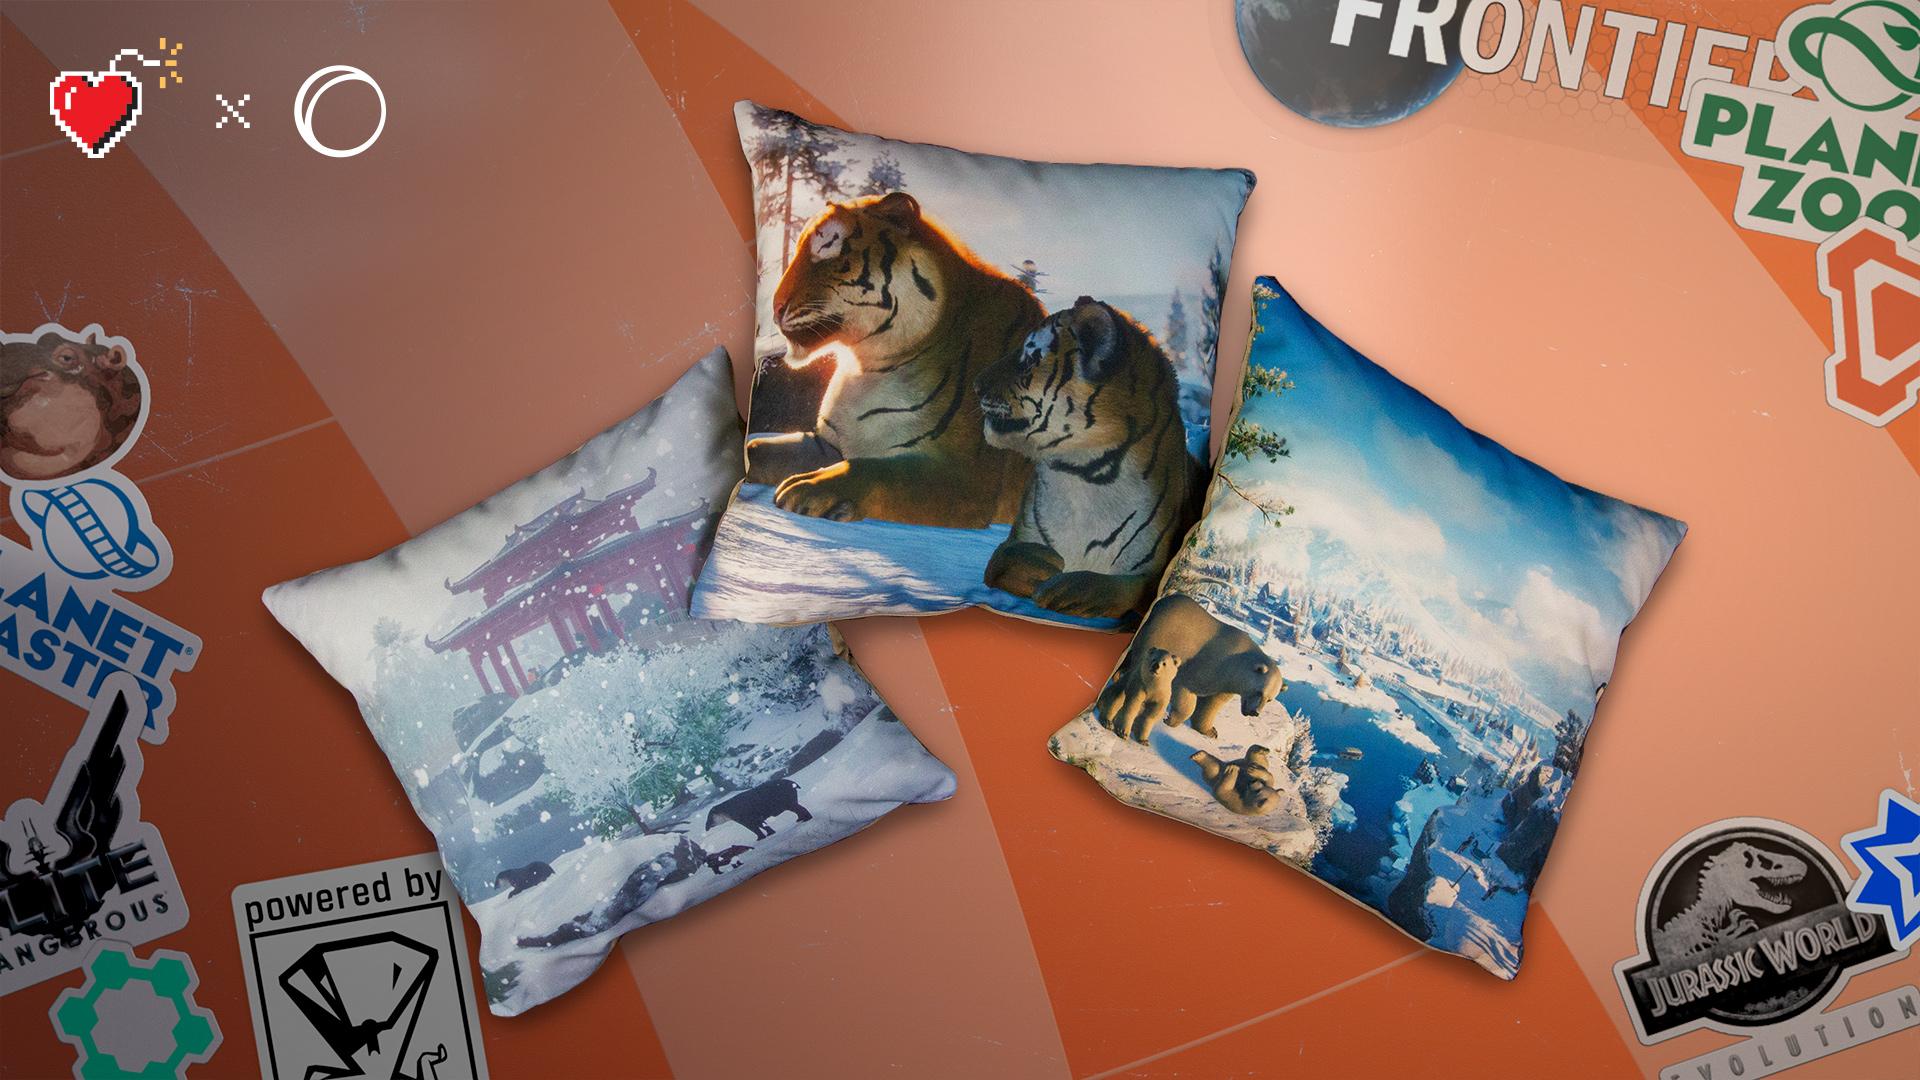 FR_charity_auction_PZ_pillows.jpg